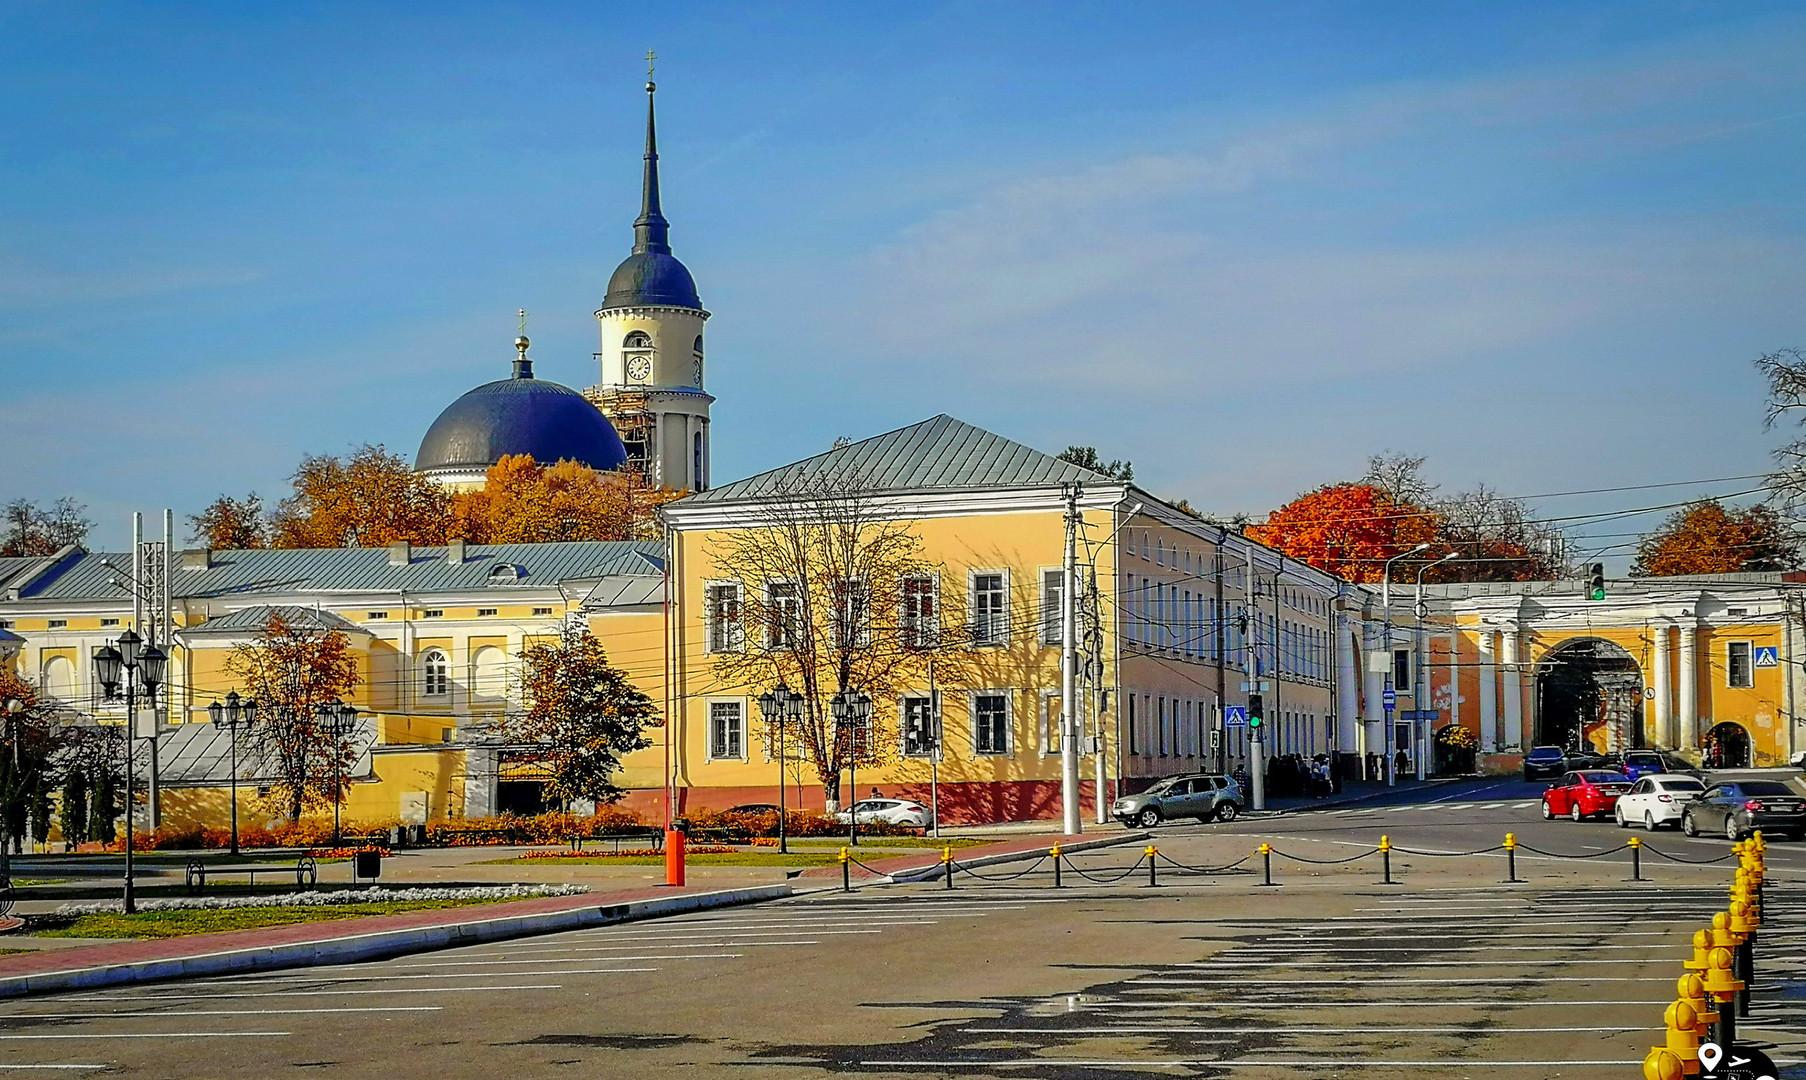 Площадь Старый Торг, Калуга